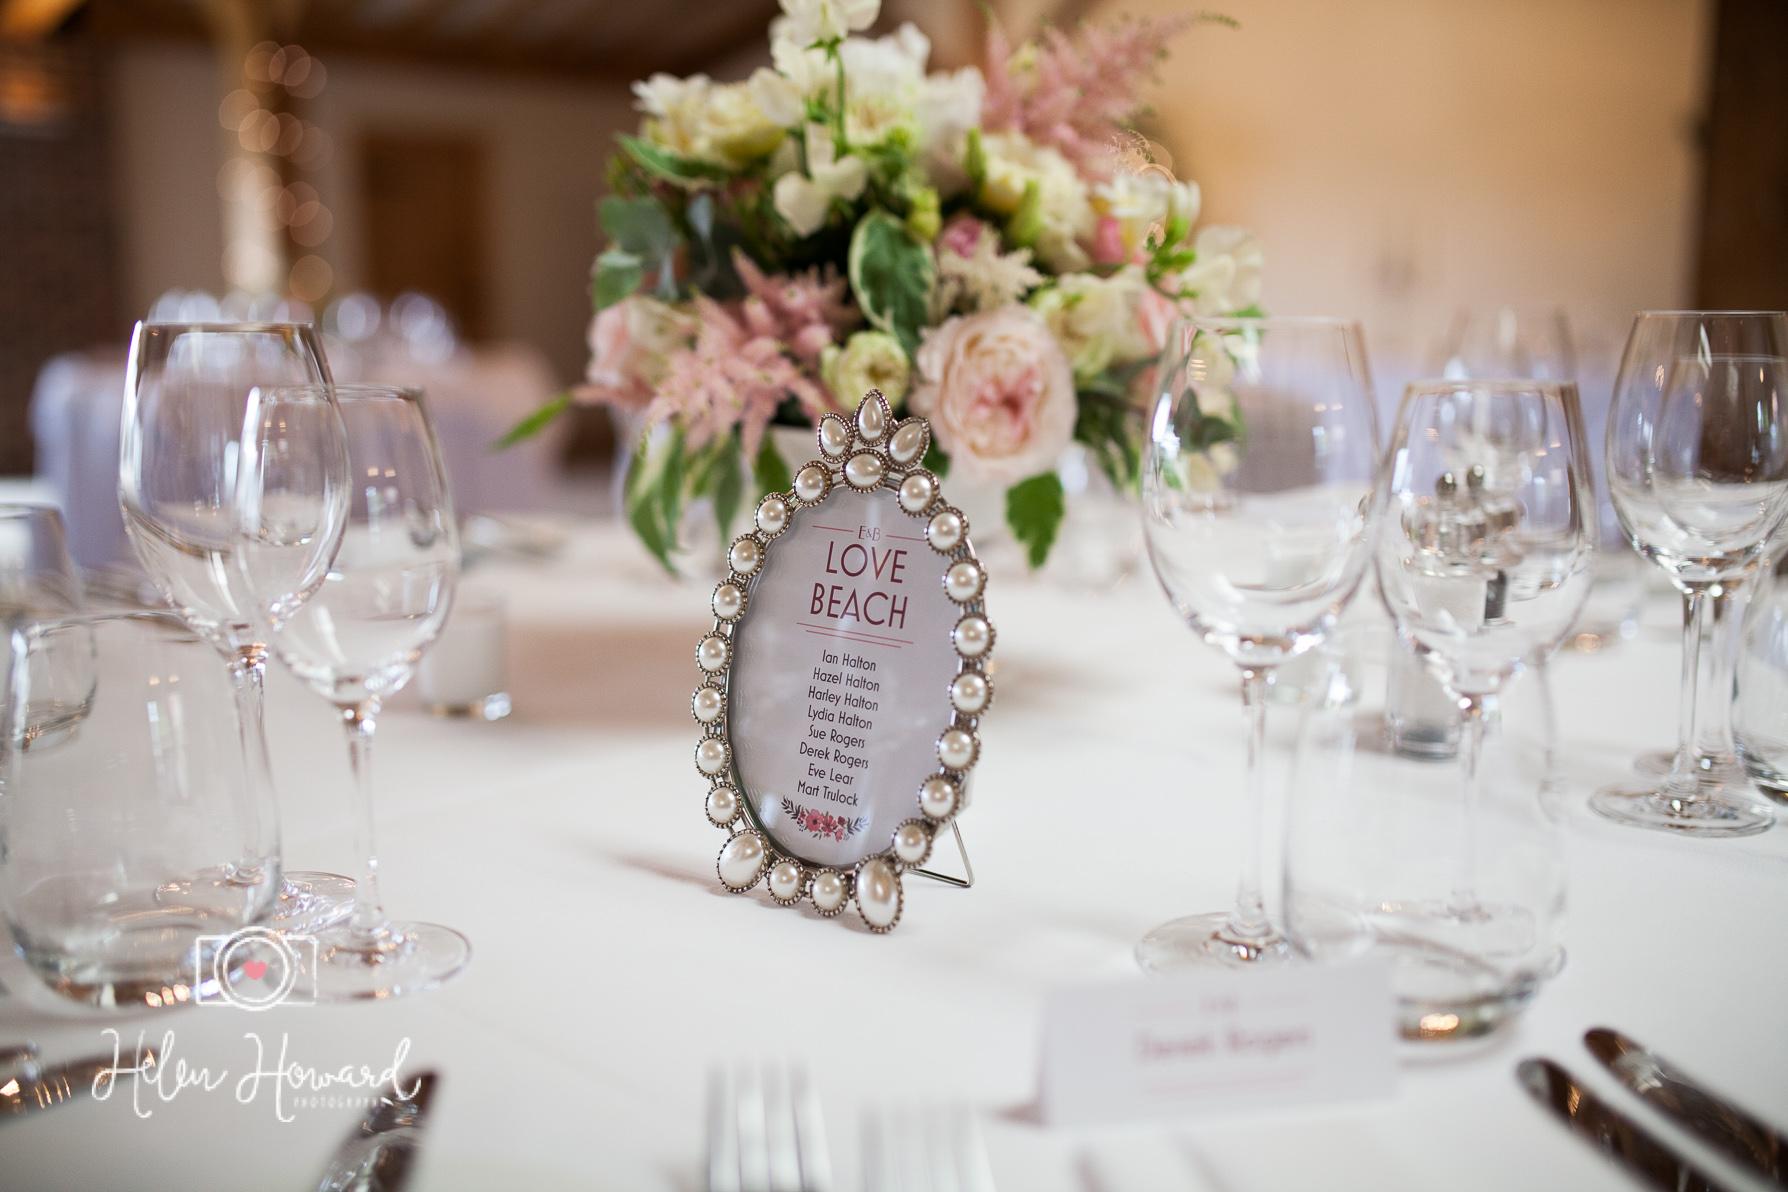 Helen Howard Photography Packington Moor Wedding-28.jpg